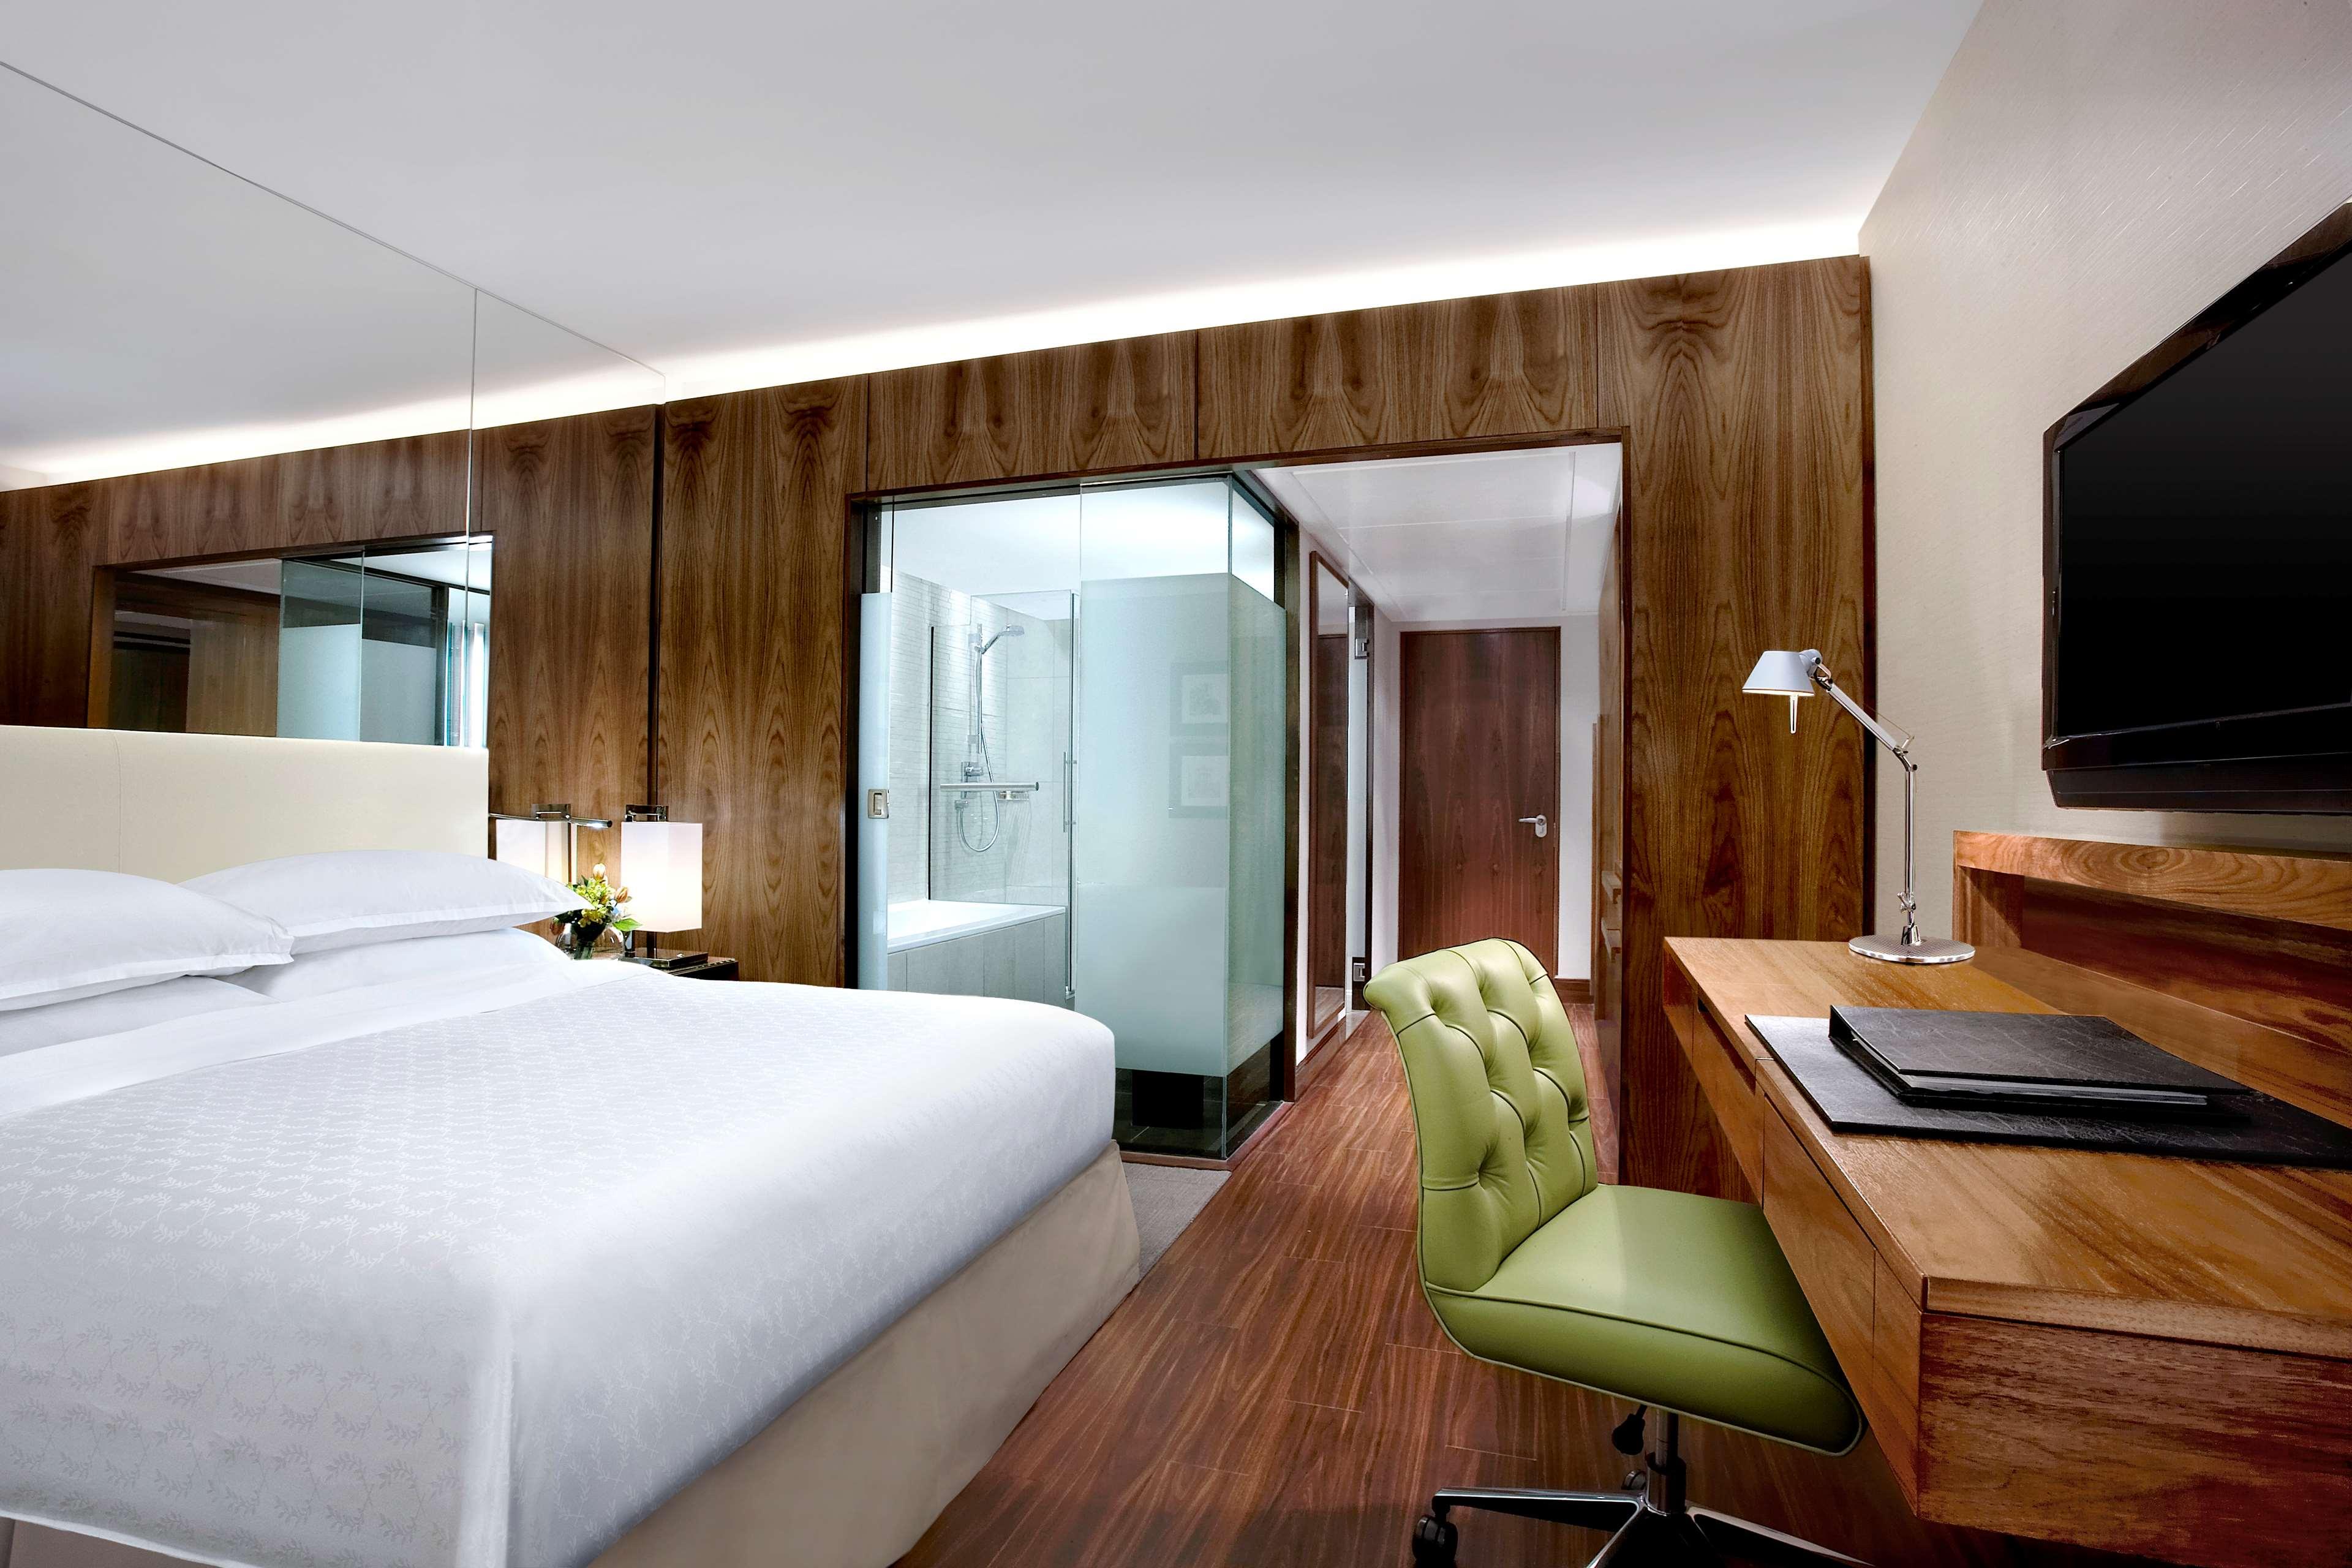 Sheraton Grand Hotel & Spa, Edinburgh